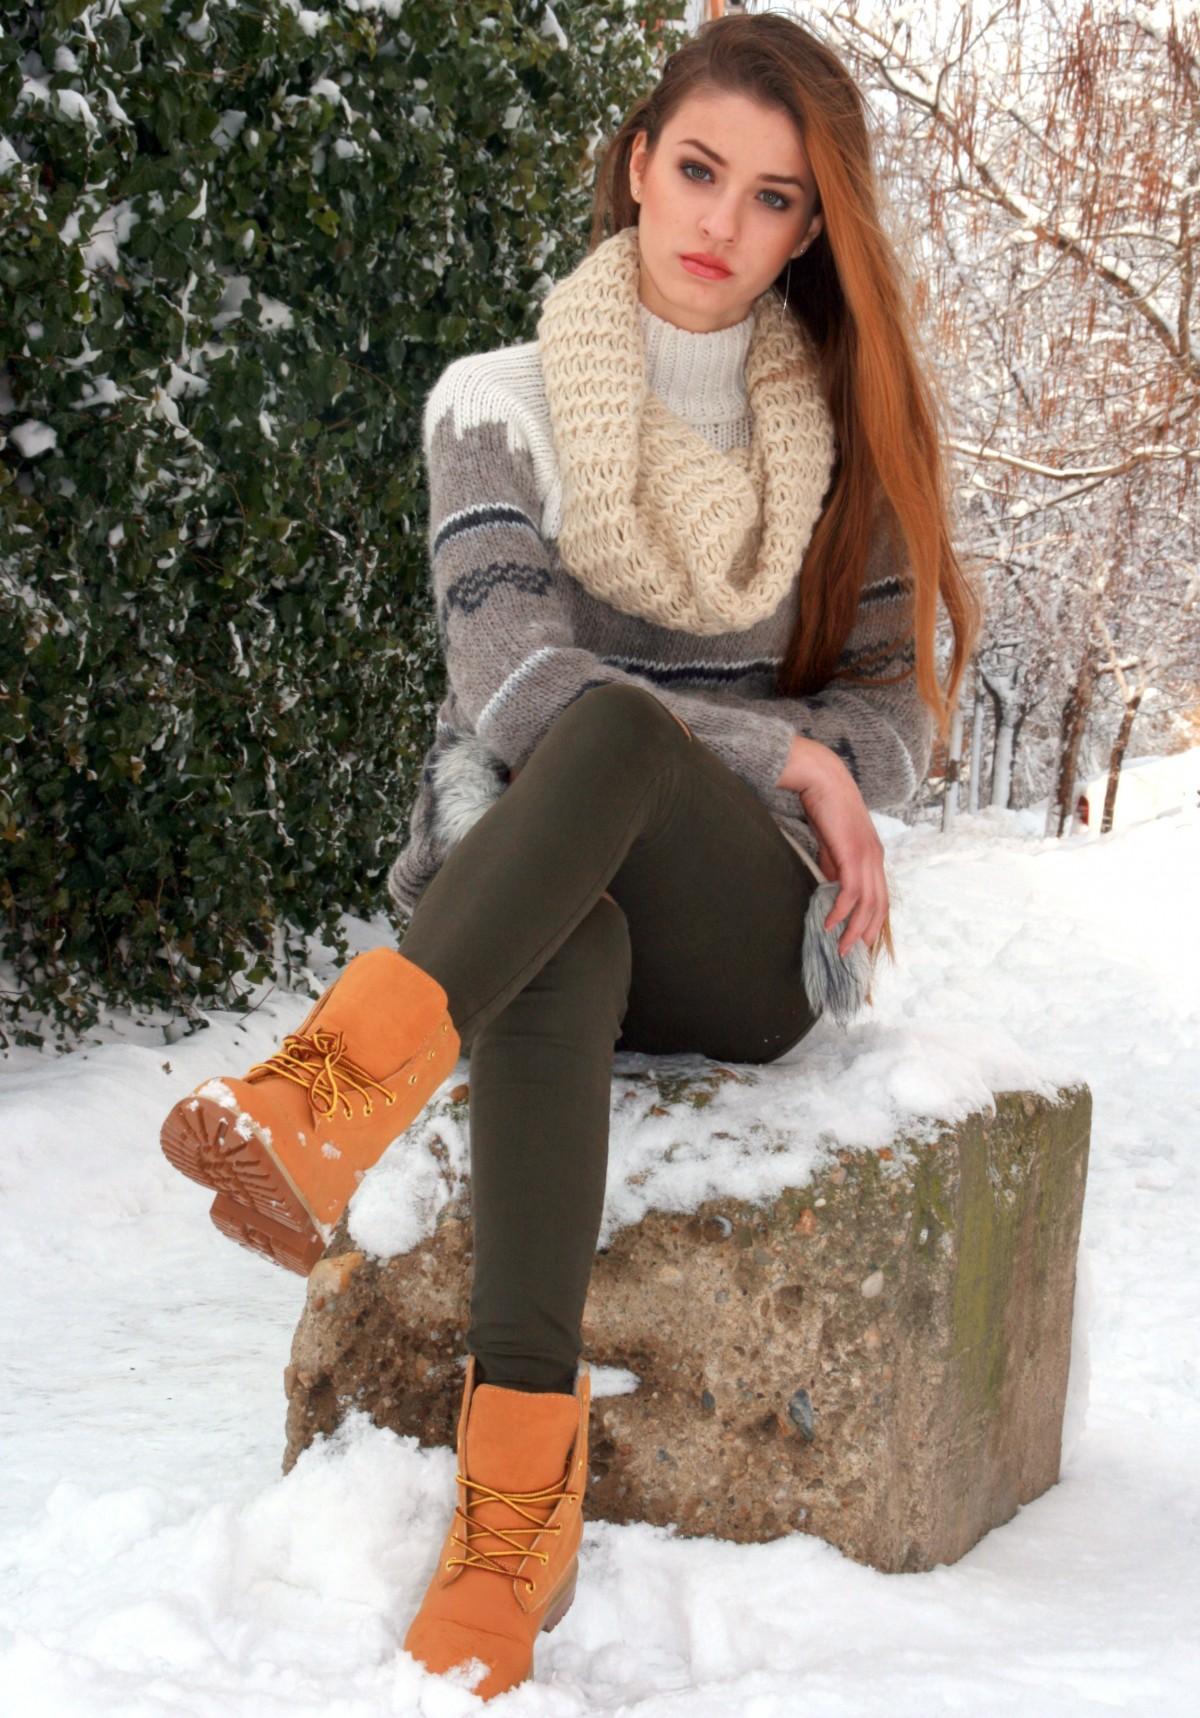 Strumpfhosen Outfits Winter